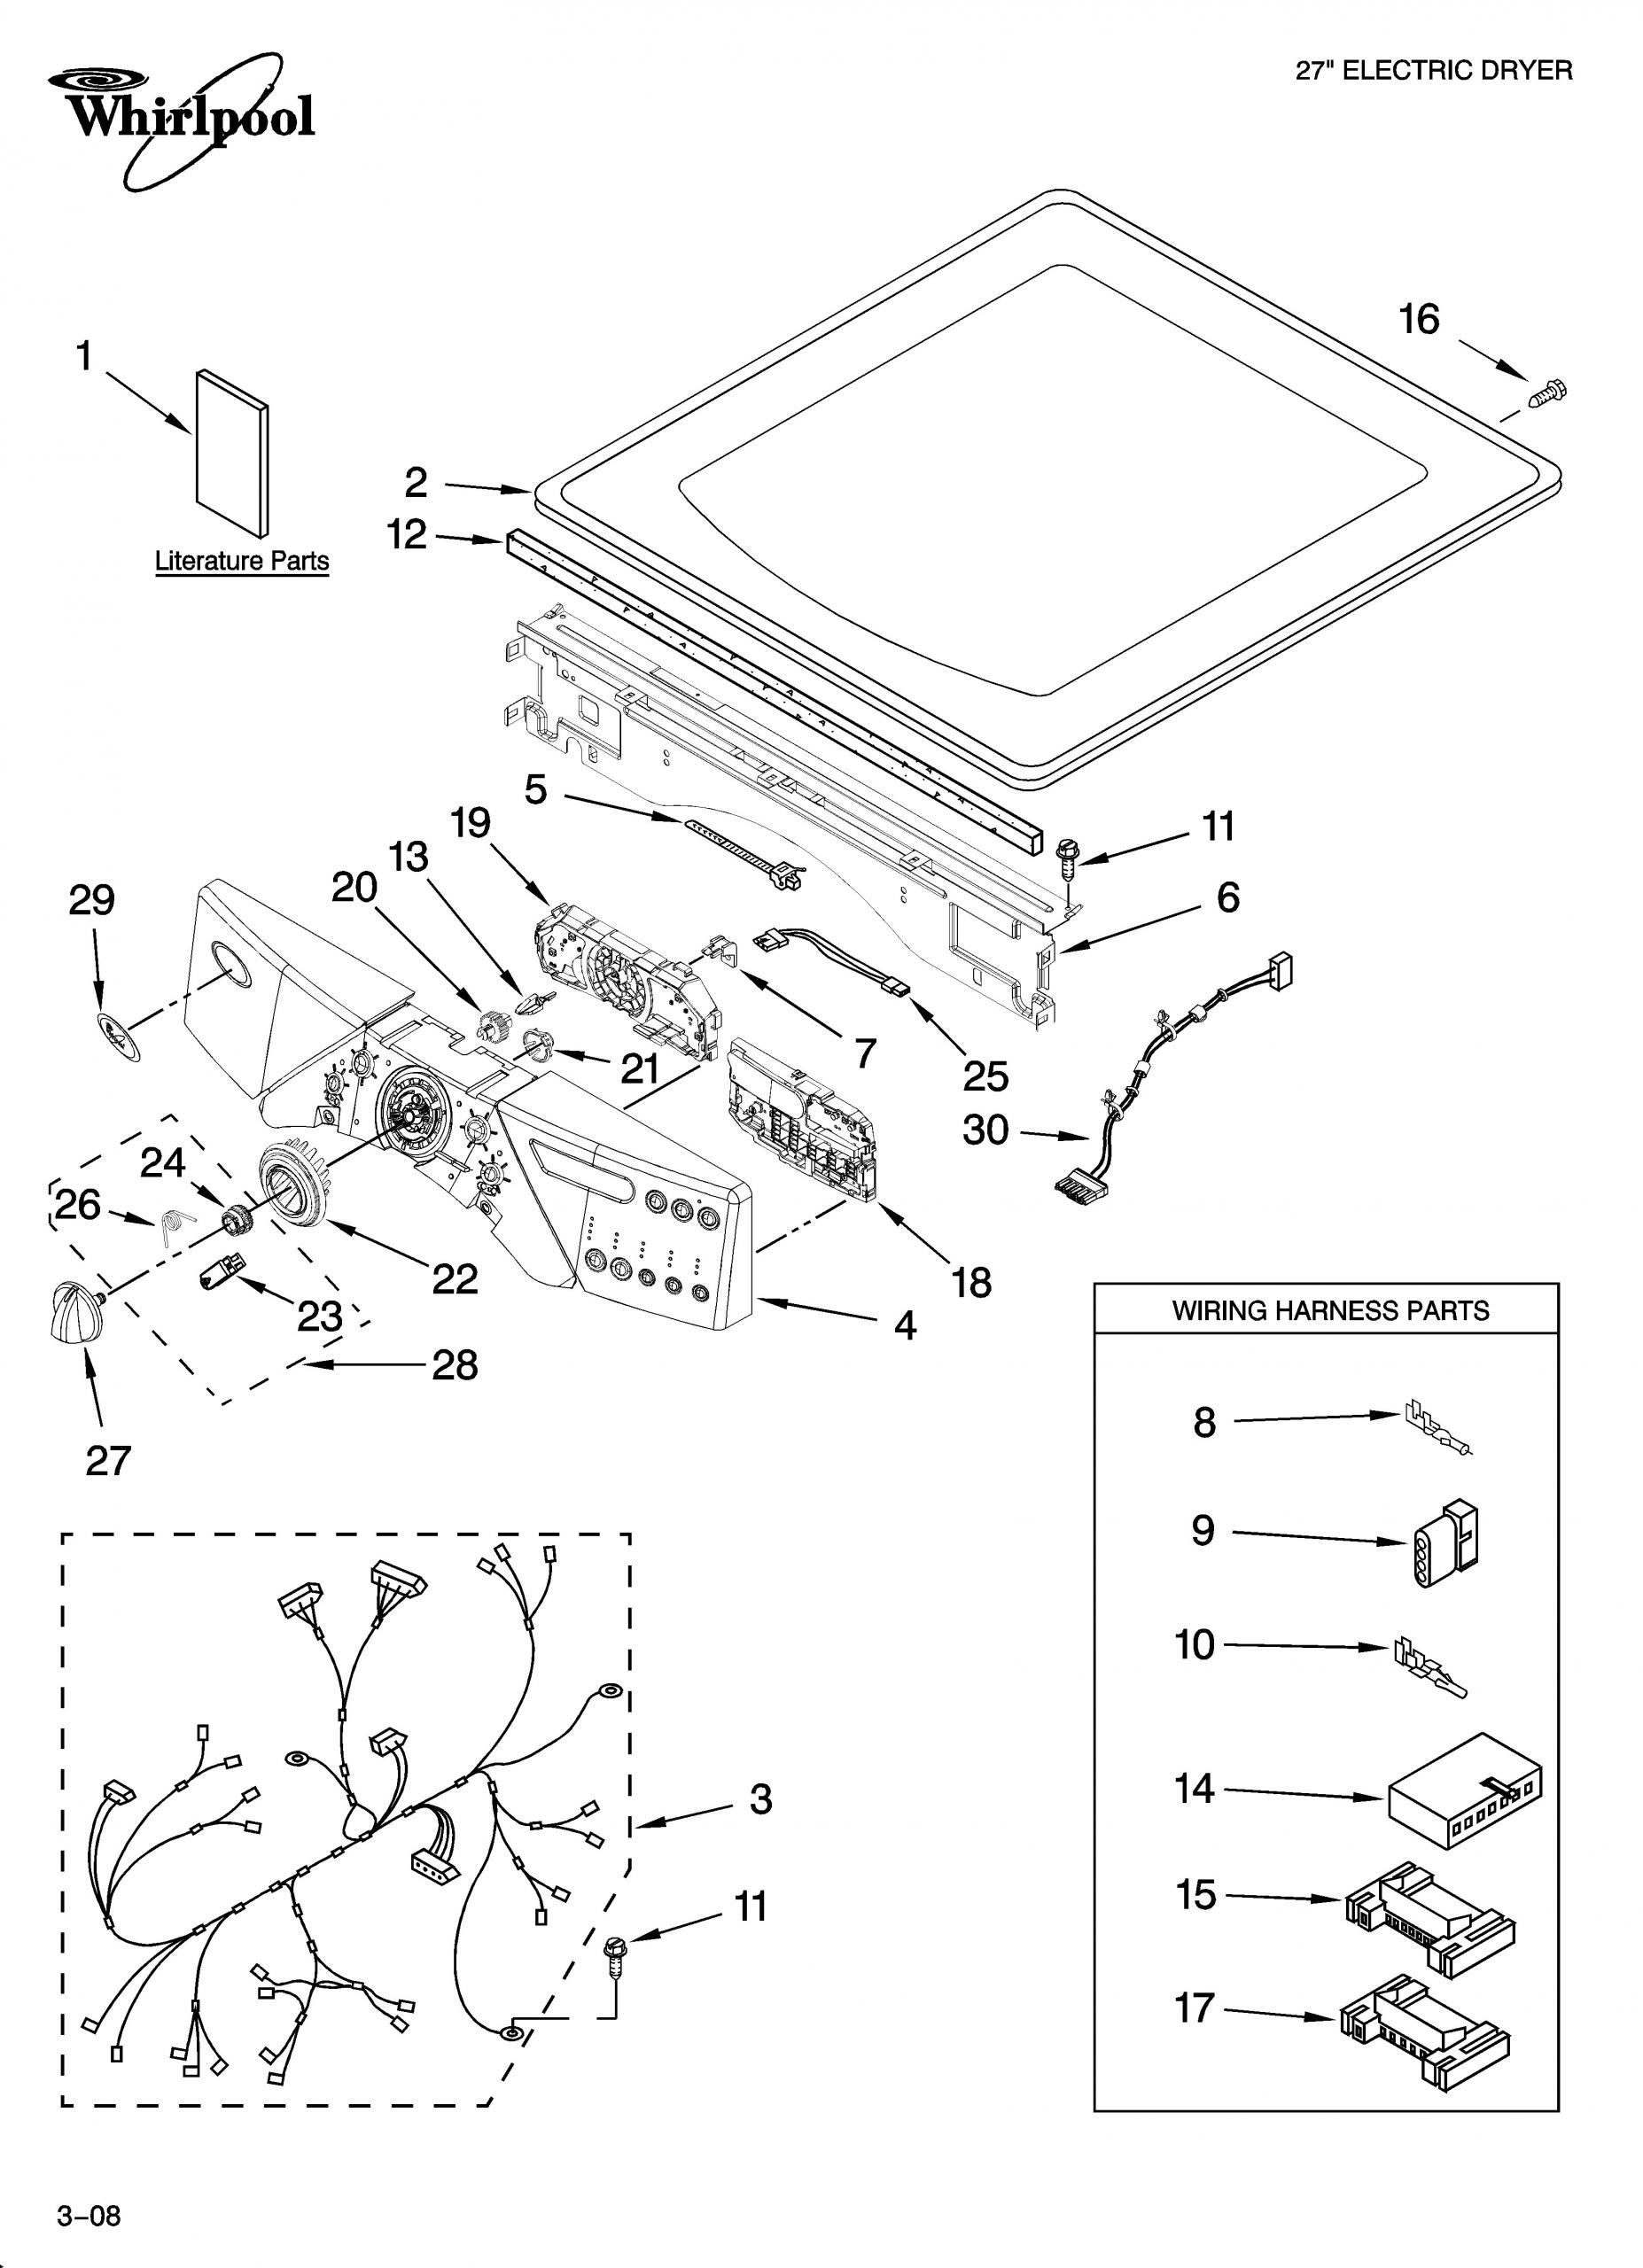 Asko Dishwasher Dbi675 Parts Diagram [diagram] Wiring Diagram for asko Dishwasher Full Version Hd Quality asko Dishwasher Of Asko Dishwasher Dbi675 Parts Diagram